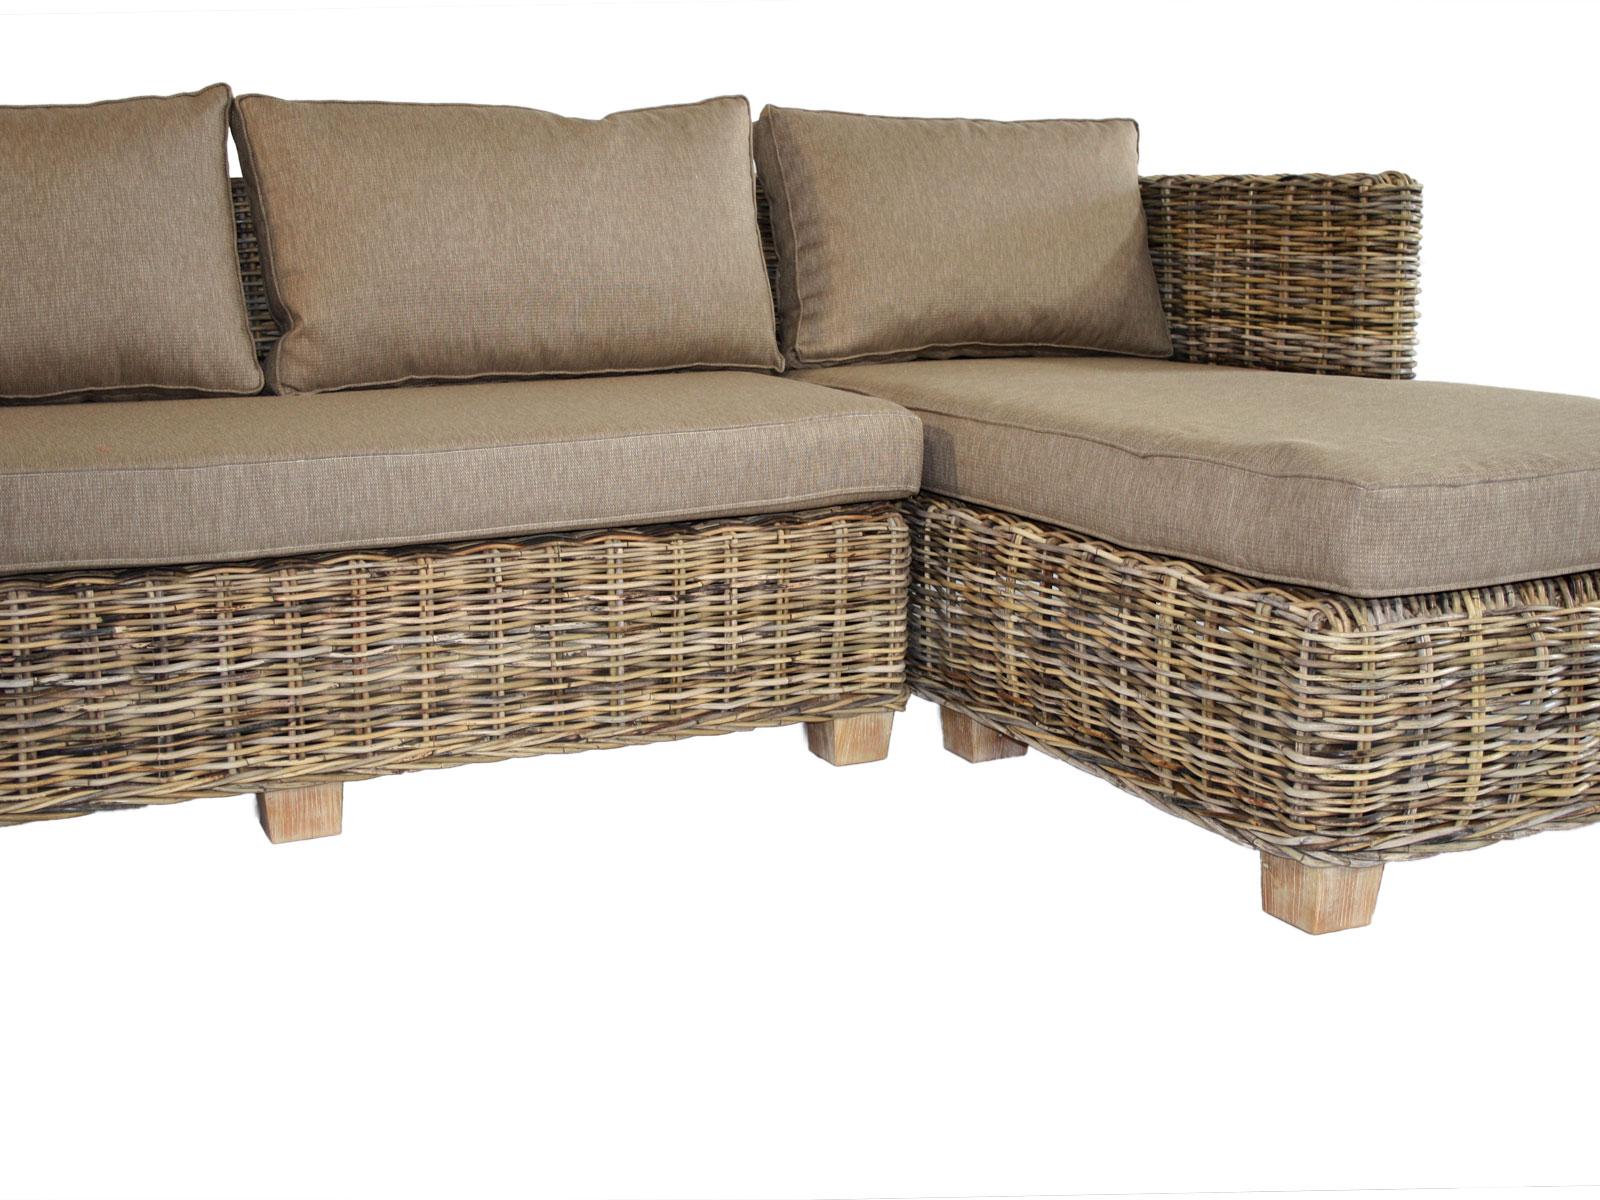 rattan sofa milan 2988R 36 02